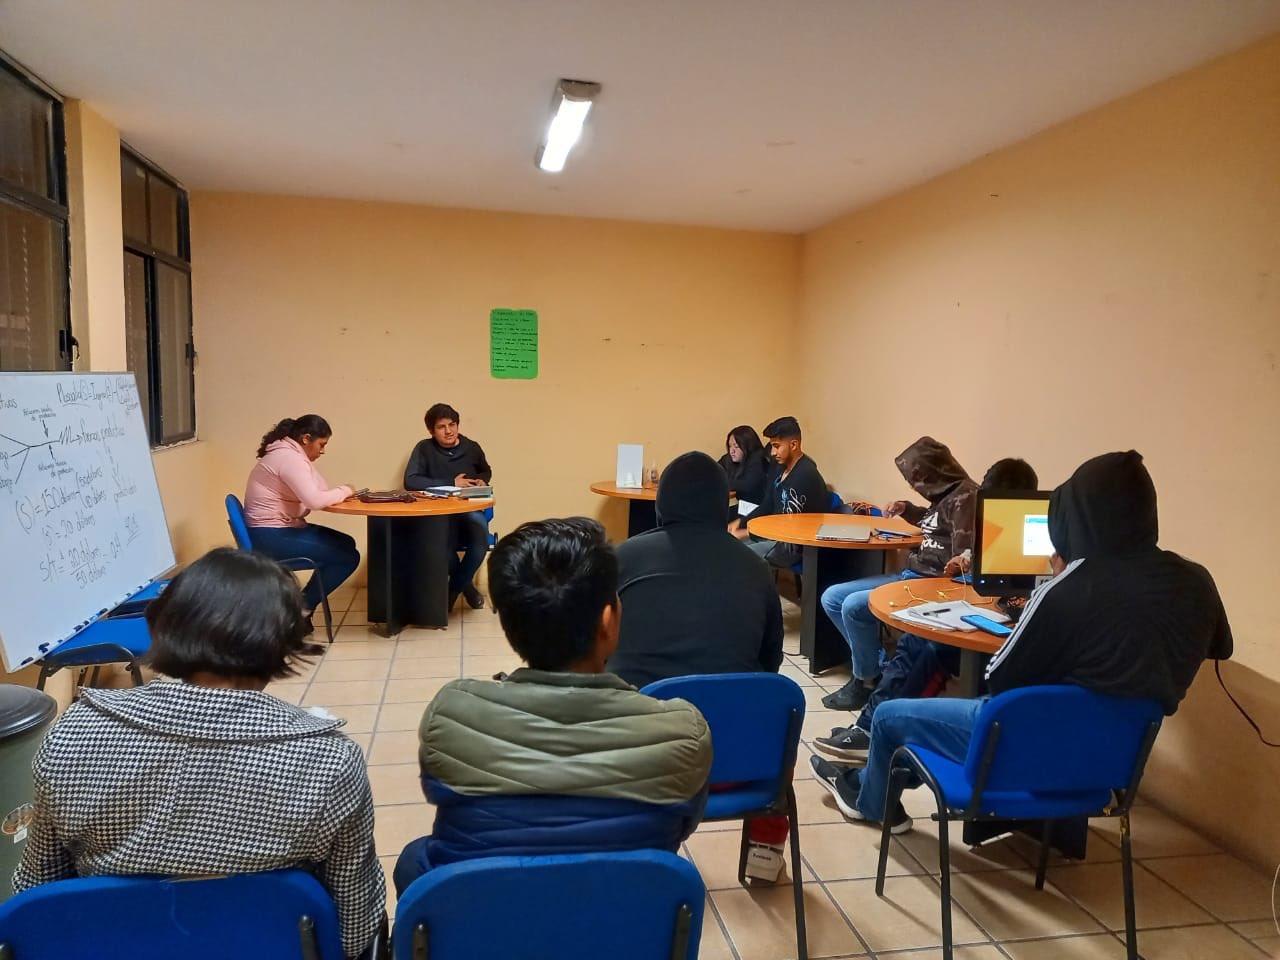 ESTUDIANTES RECIBEN POR ADELANTADO PAGO DE BECA BENITO JUÁREZ